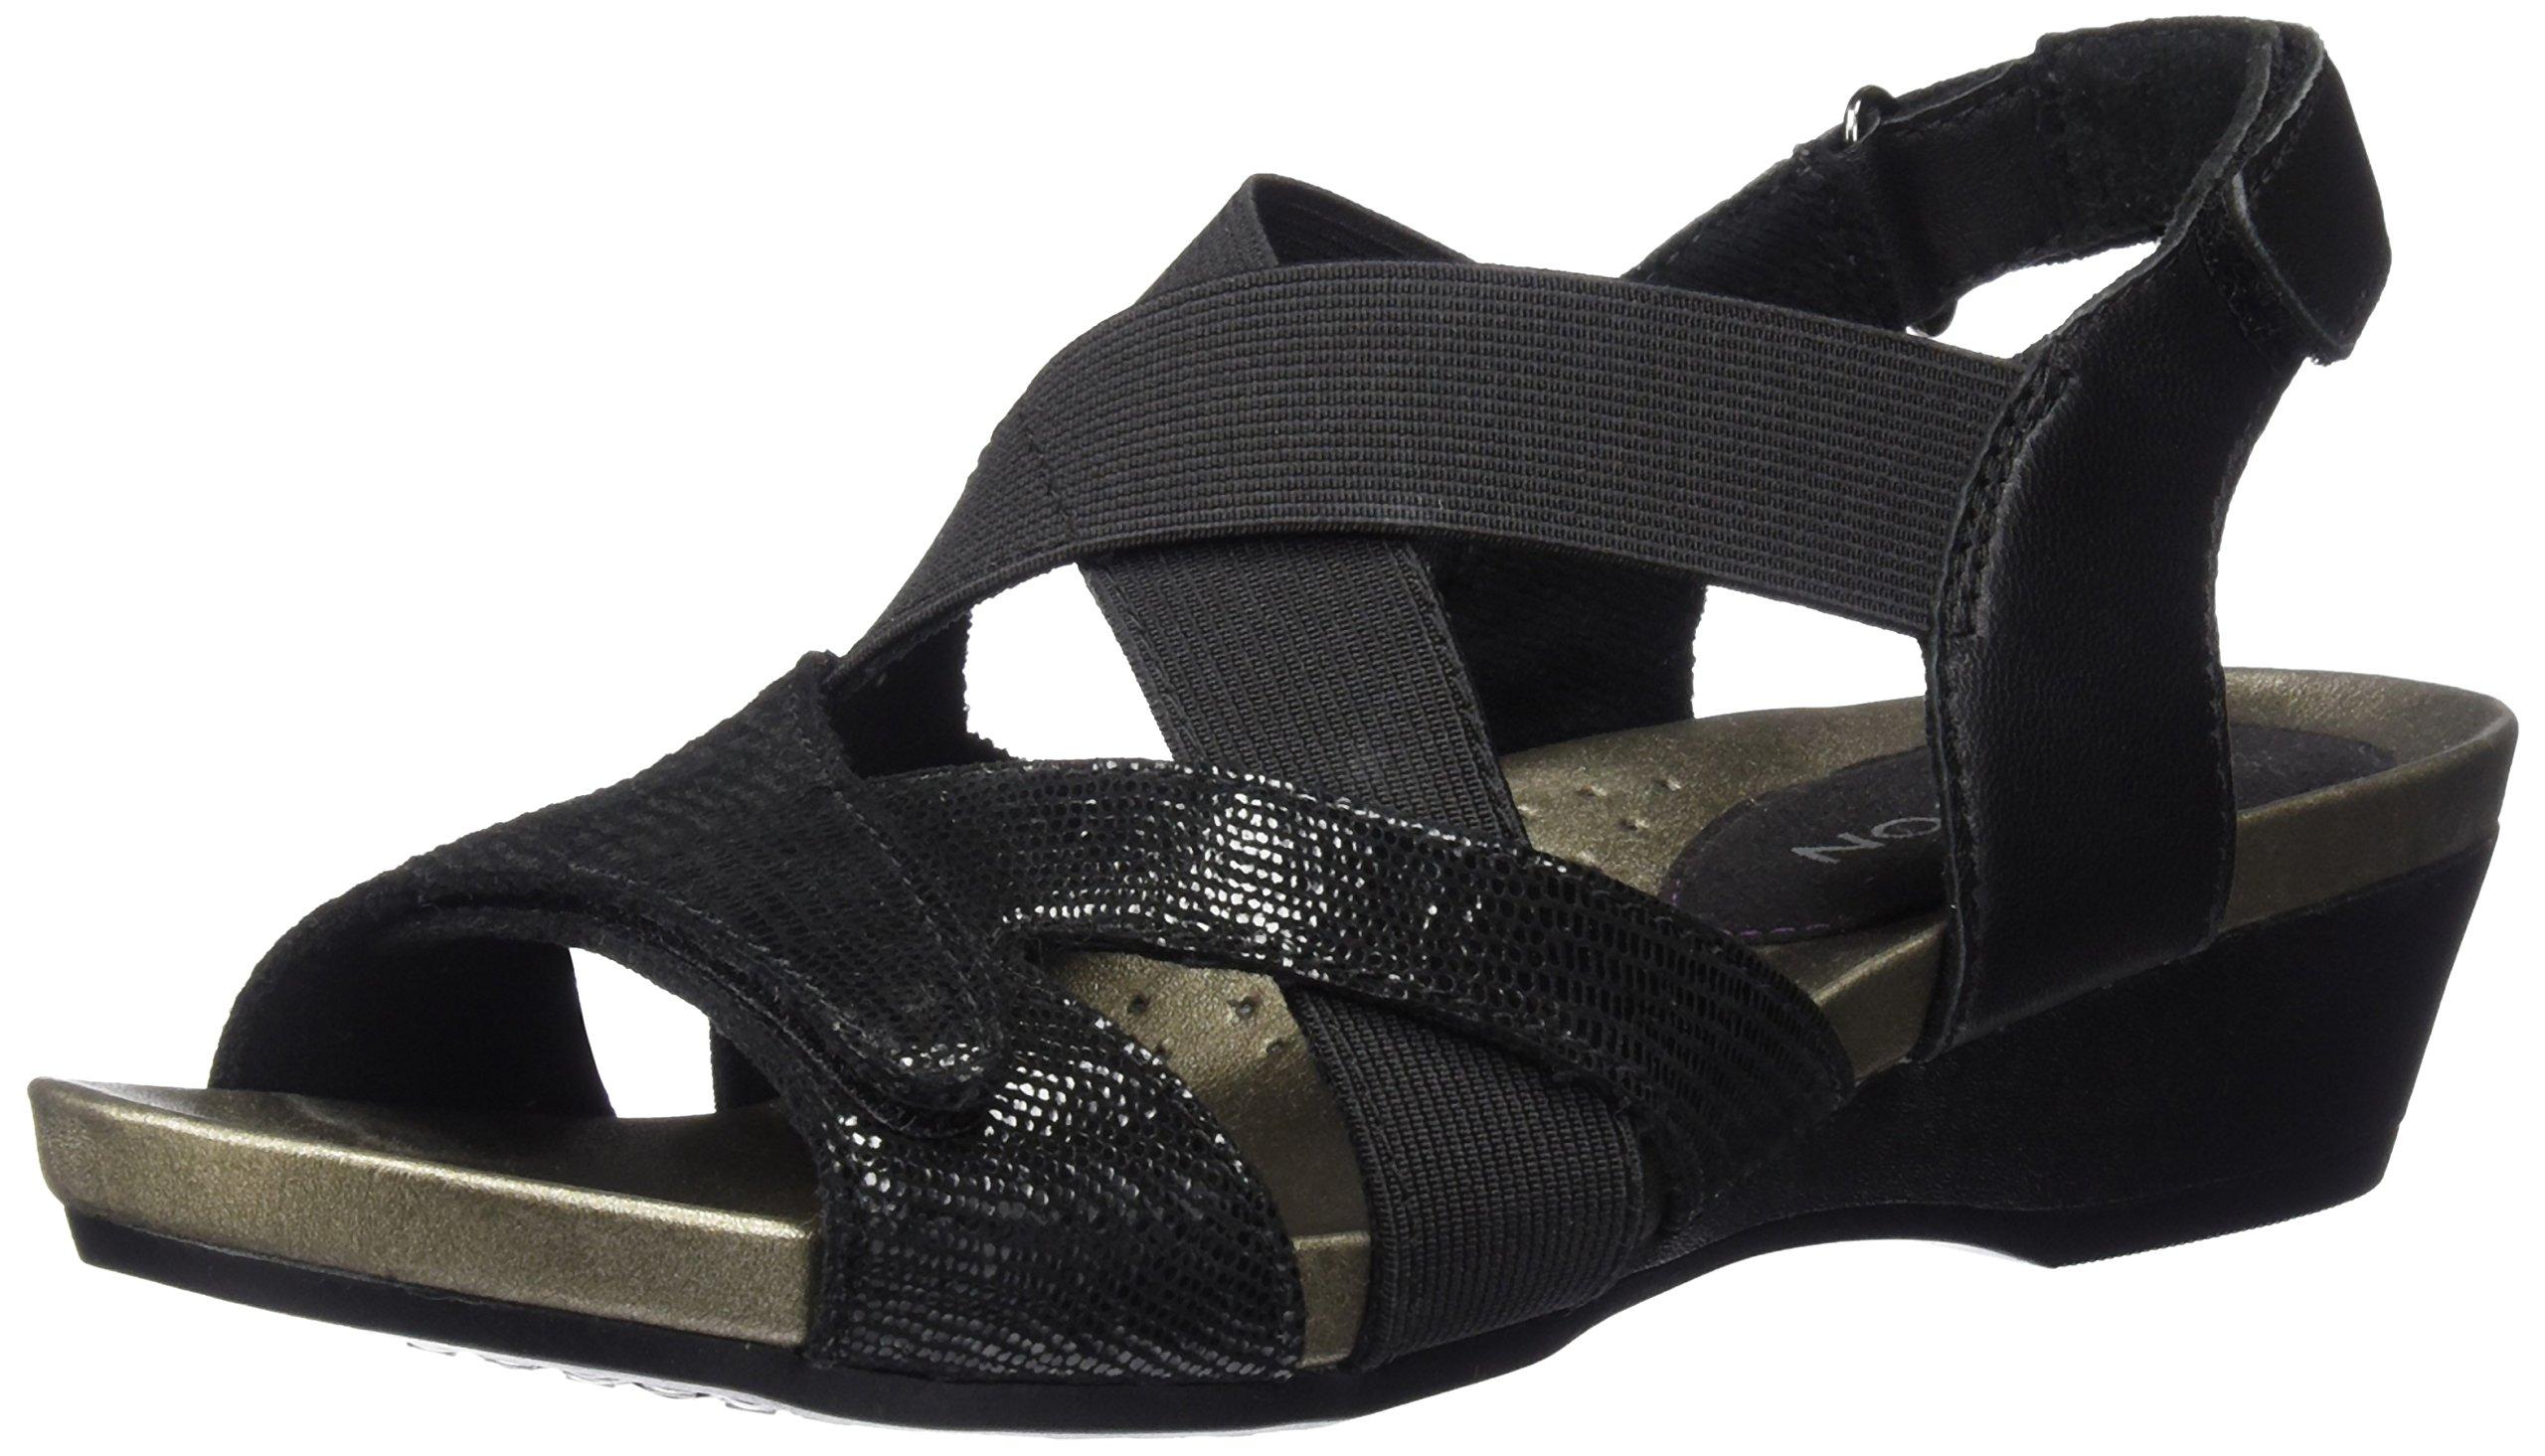 Aravon Women's Standon X Strap Heeled Sandal, Black, 6 D US